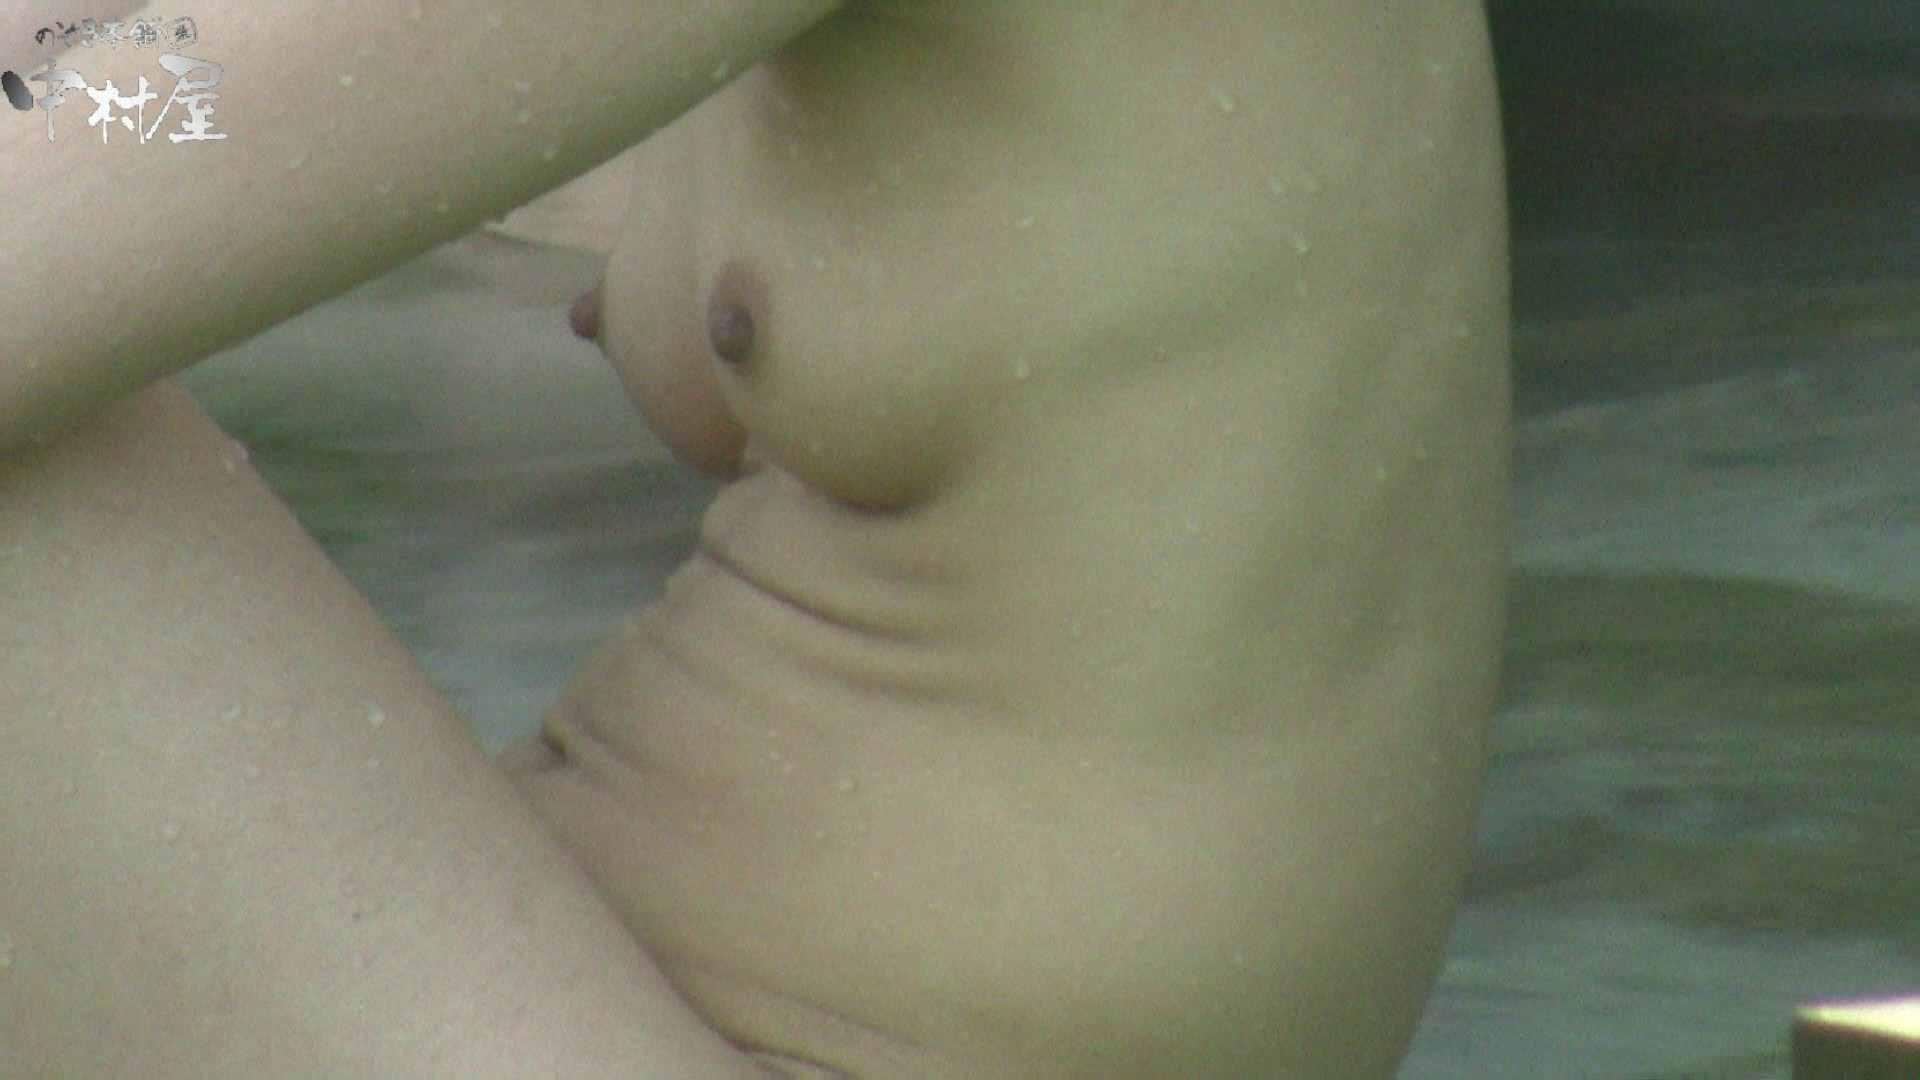 Aquaな露天風呂Vol.970 露天 | OLセックス  97画像 76